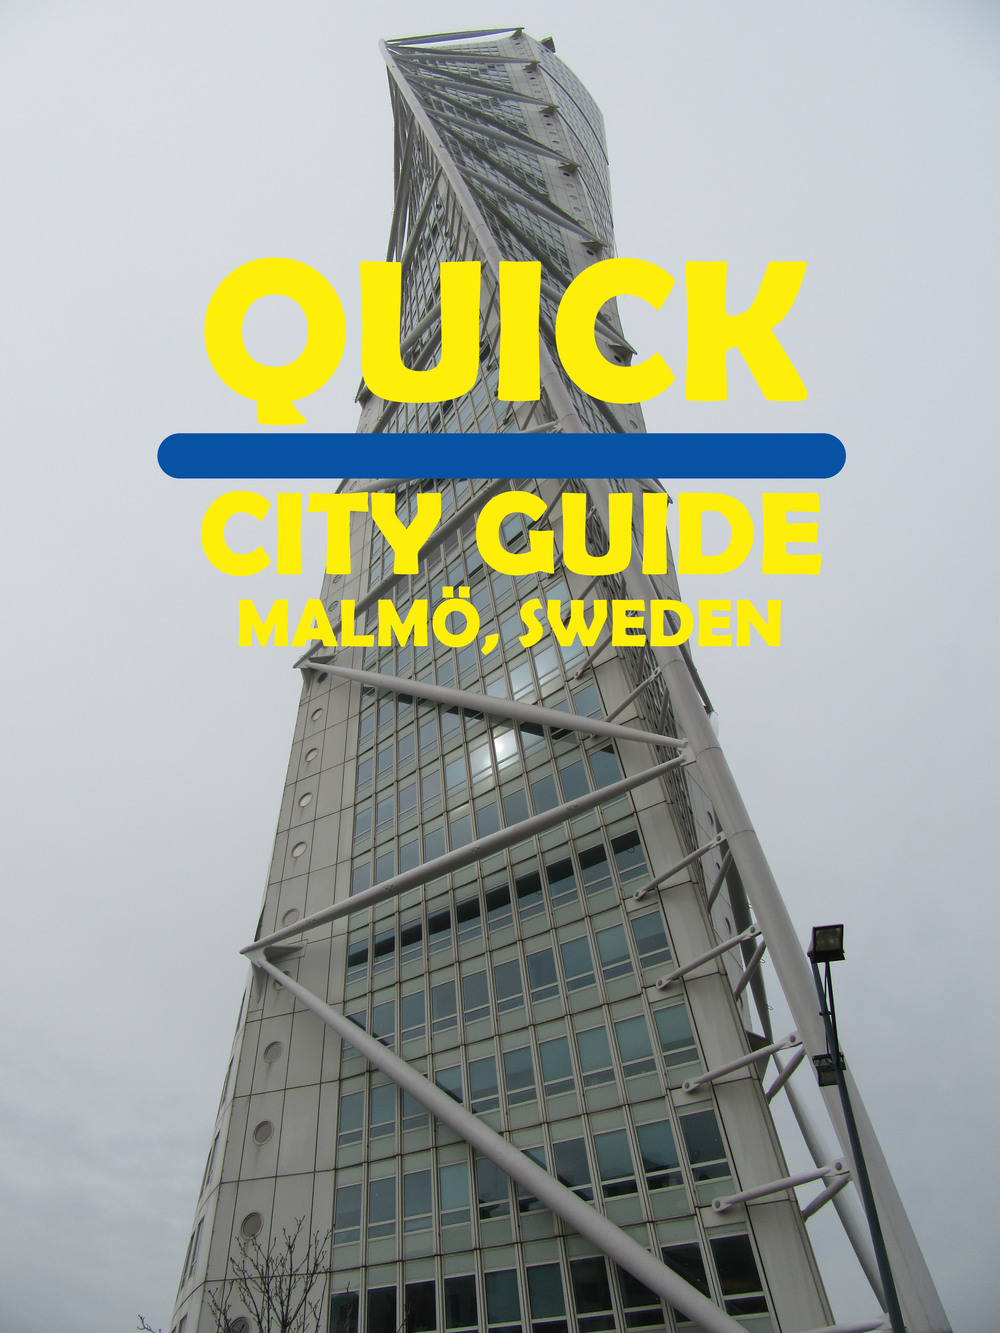 Quick-City-Guide-Malmo-Sweden-Pinterest